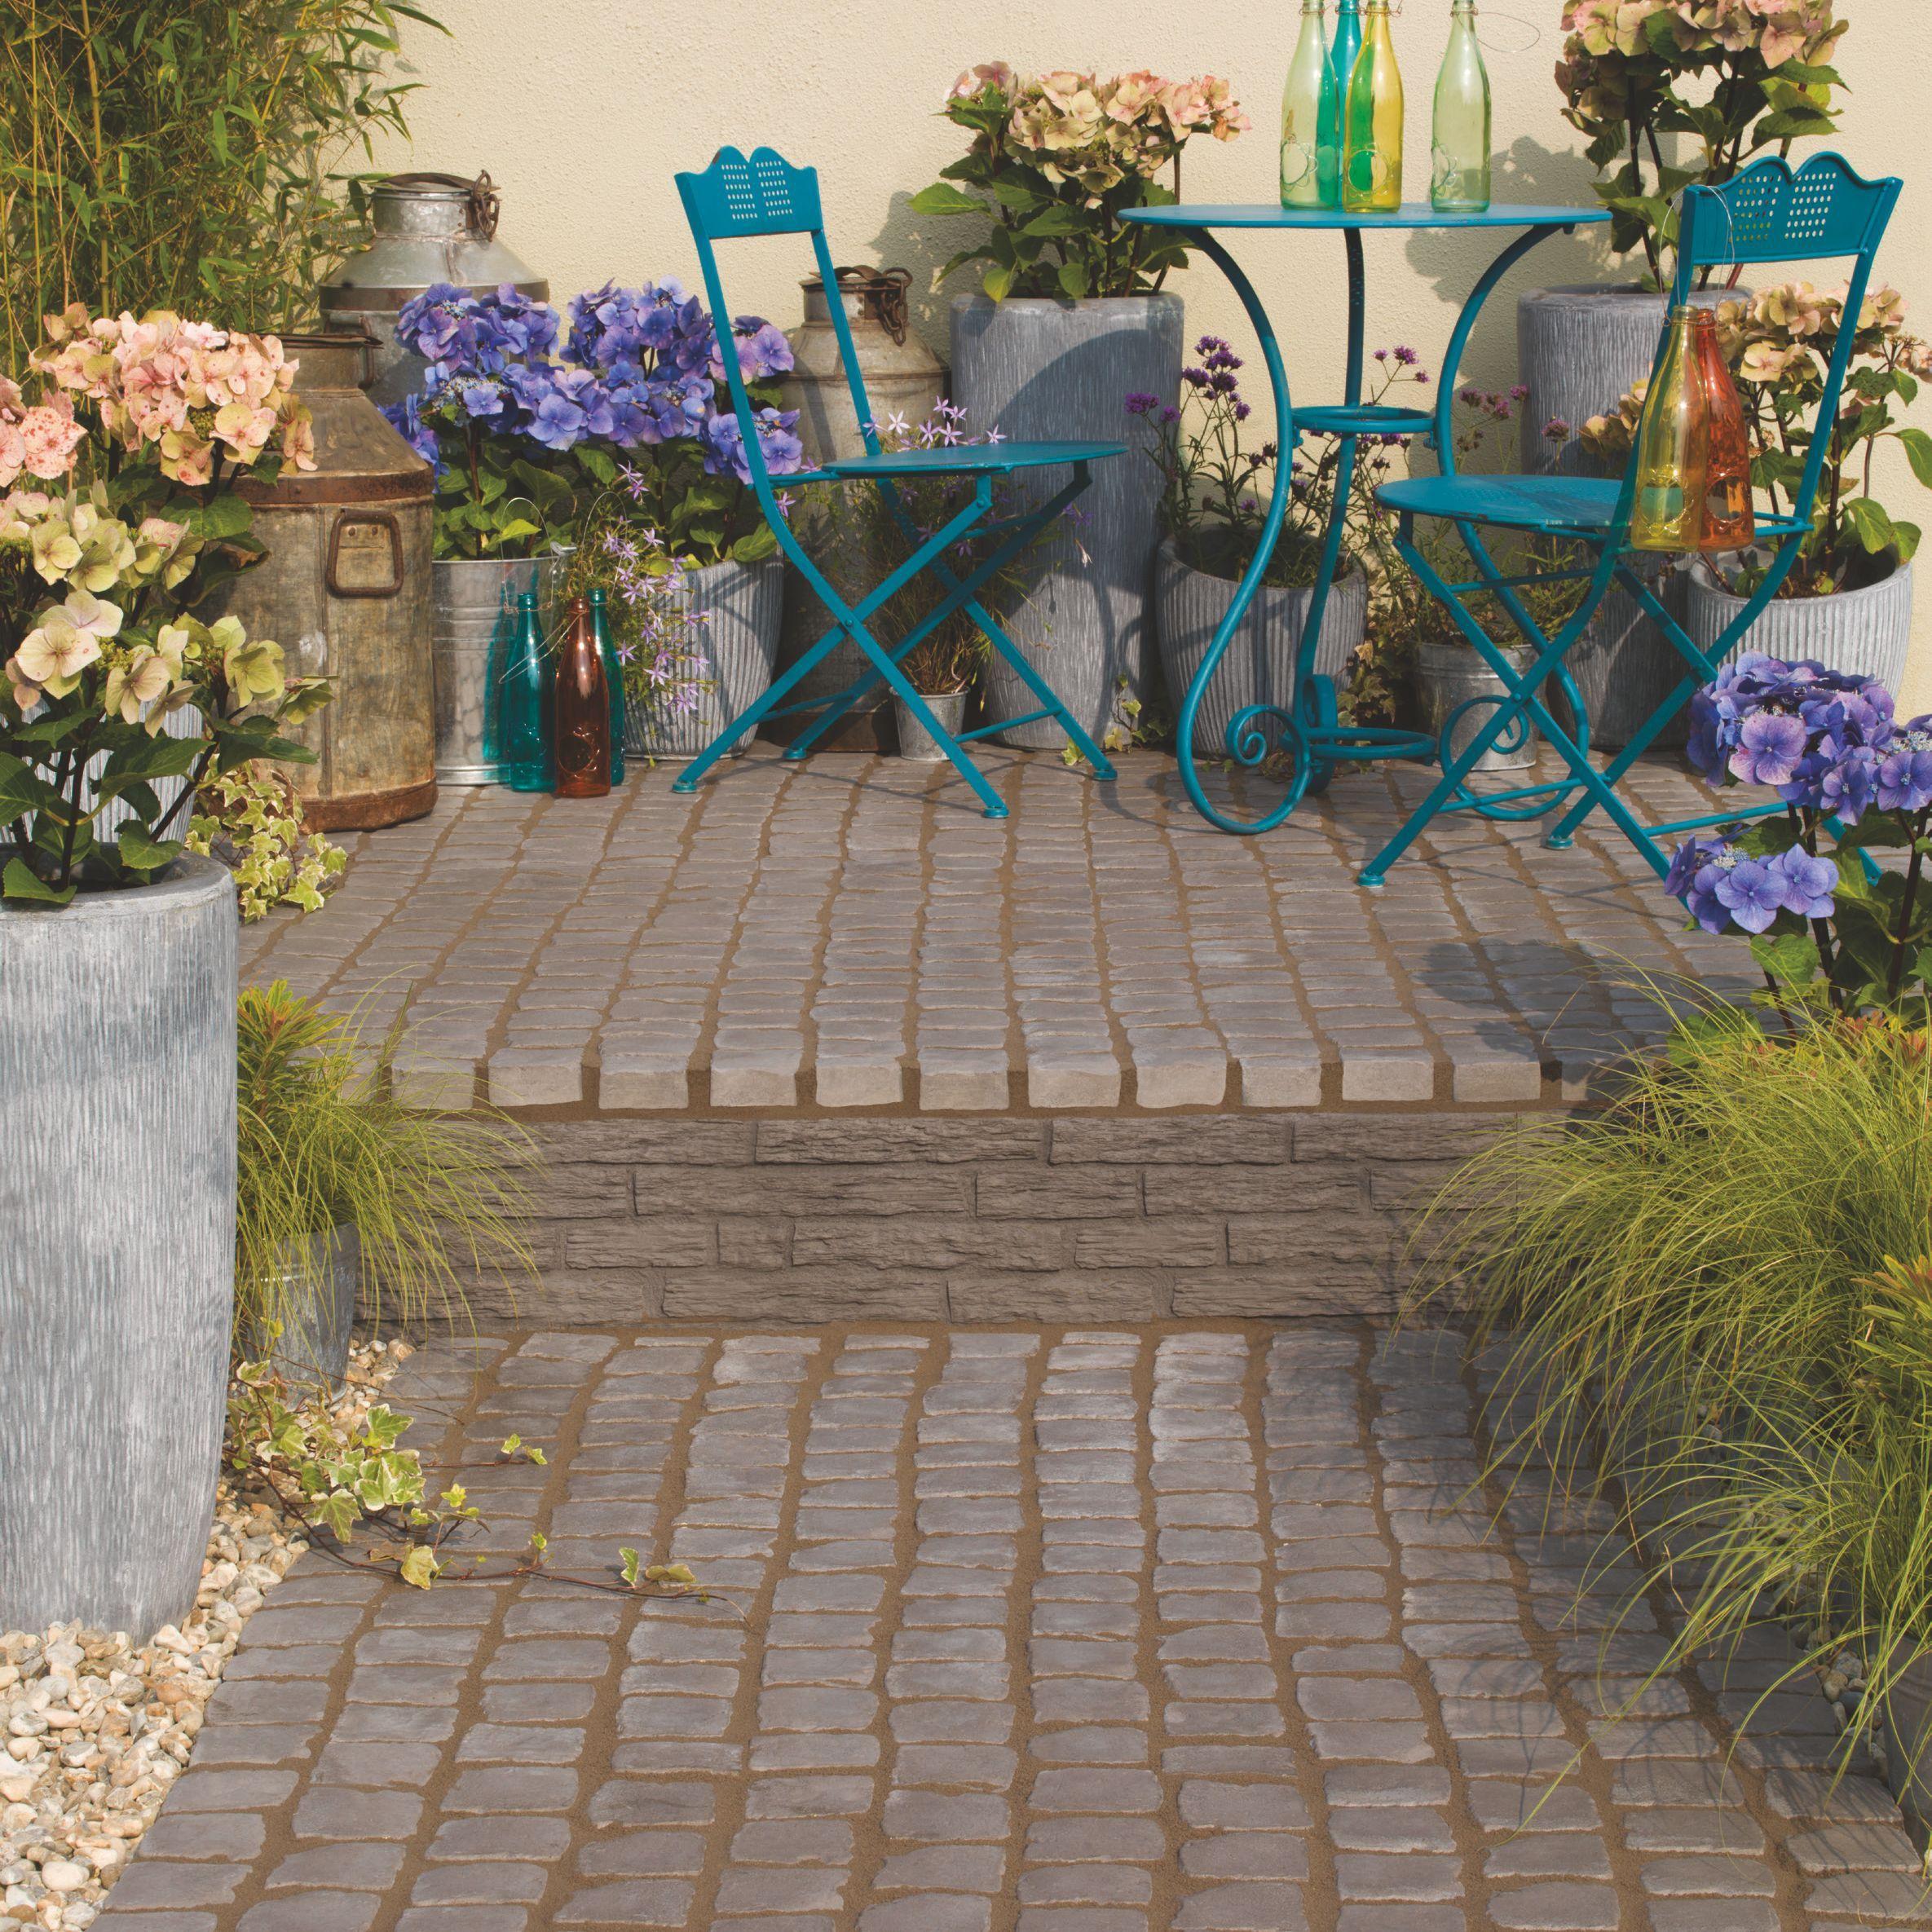 Charcoal Carpet Stone 0 5m In 2020 Garden Paving Garden Design Wooden Garden Planters